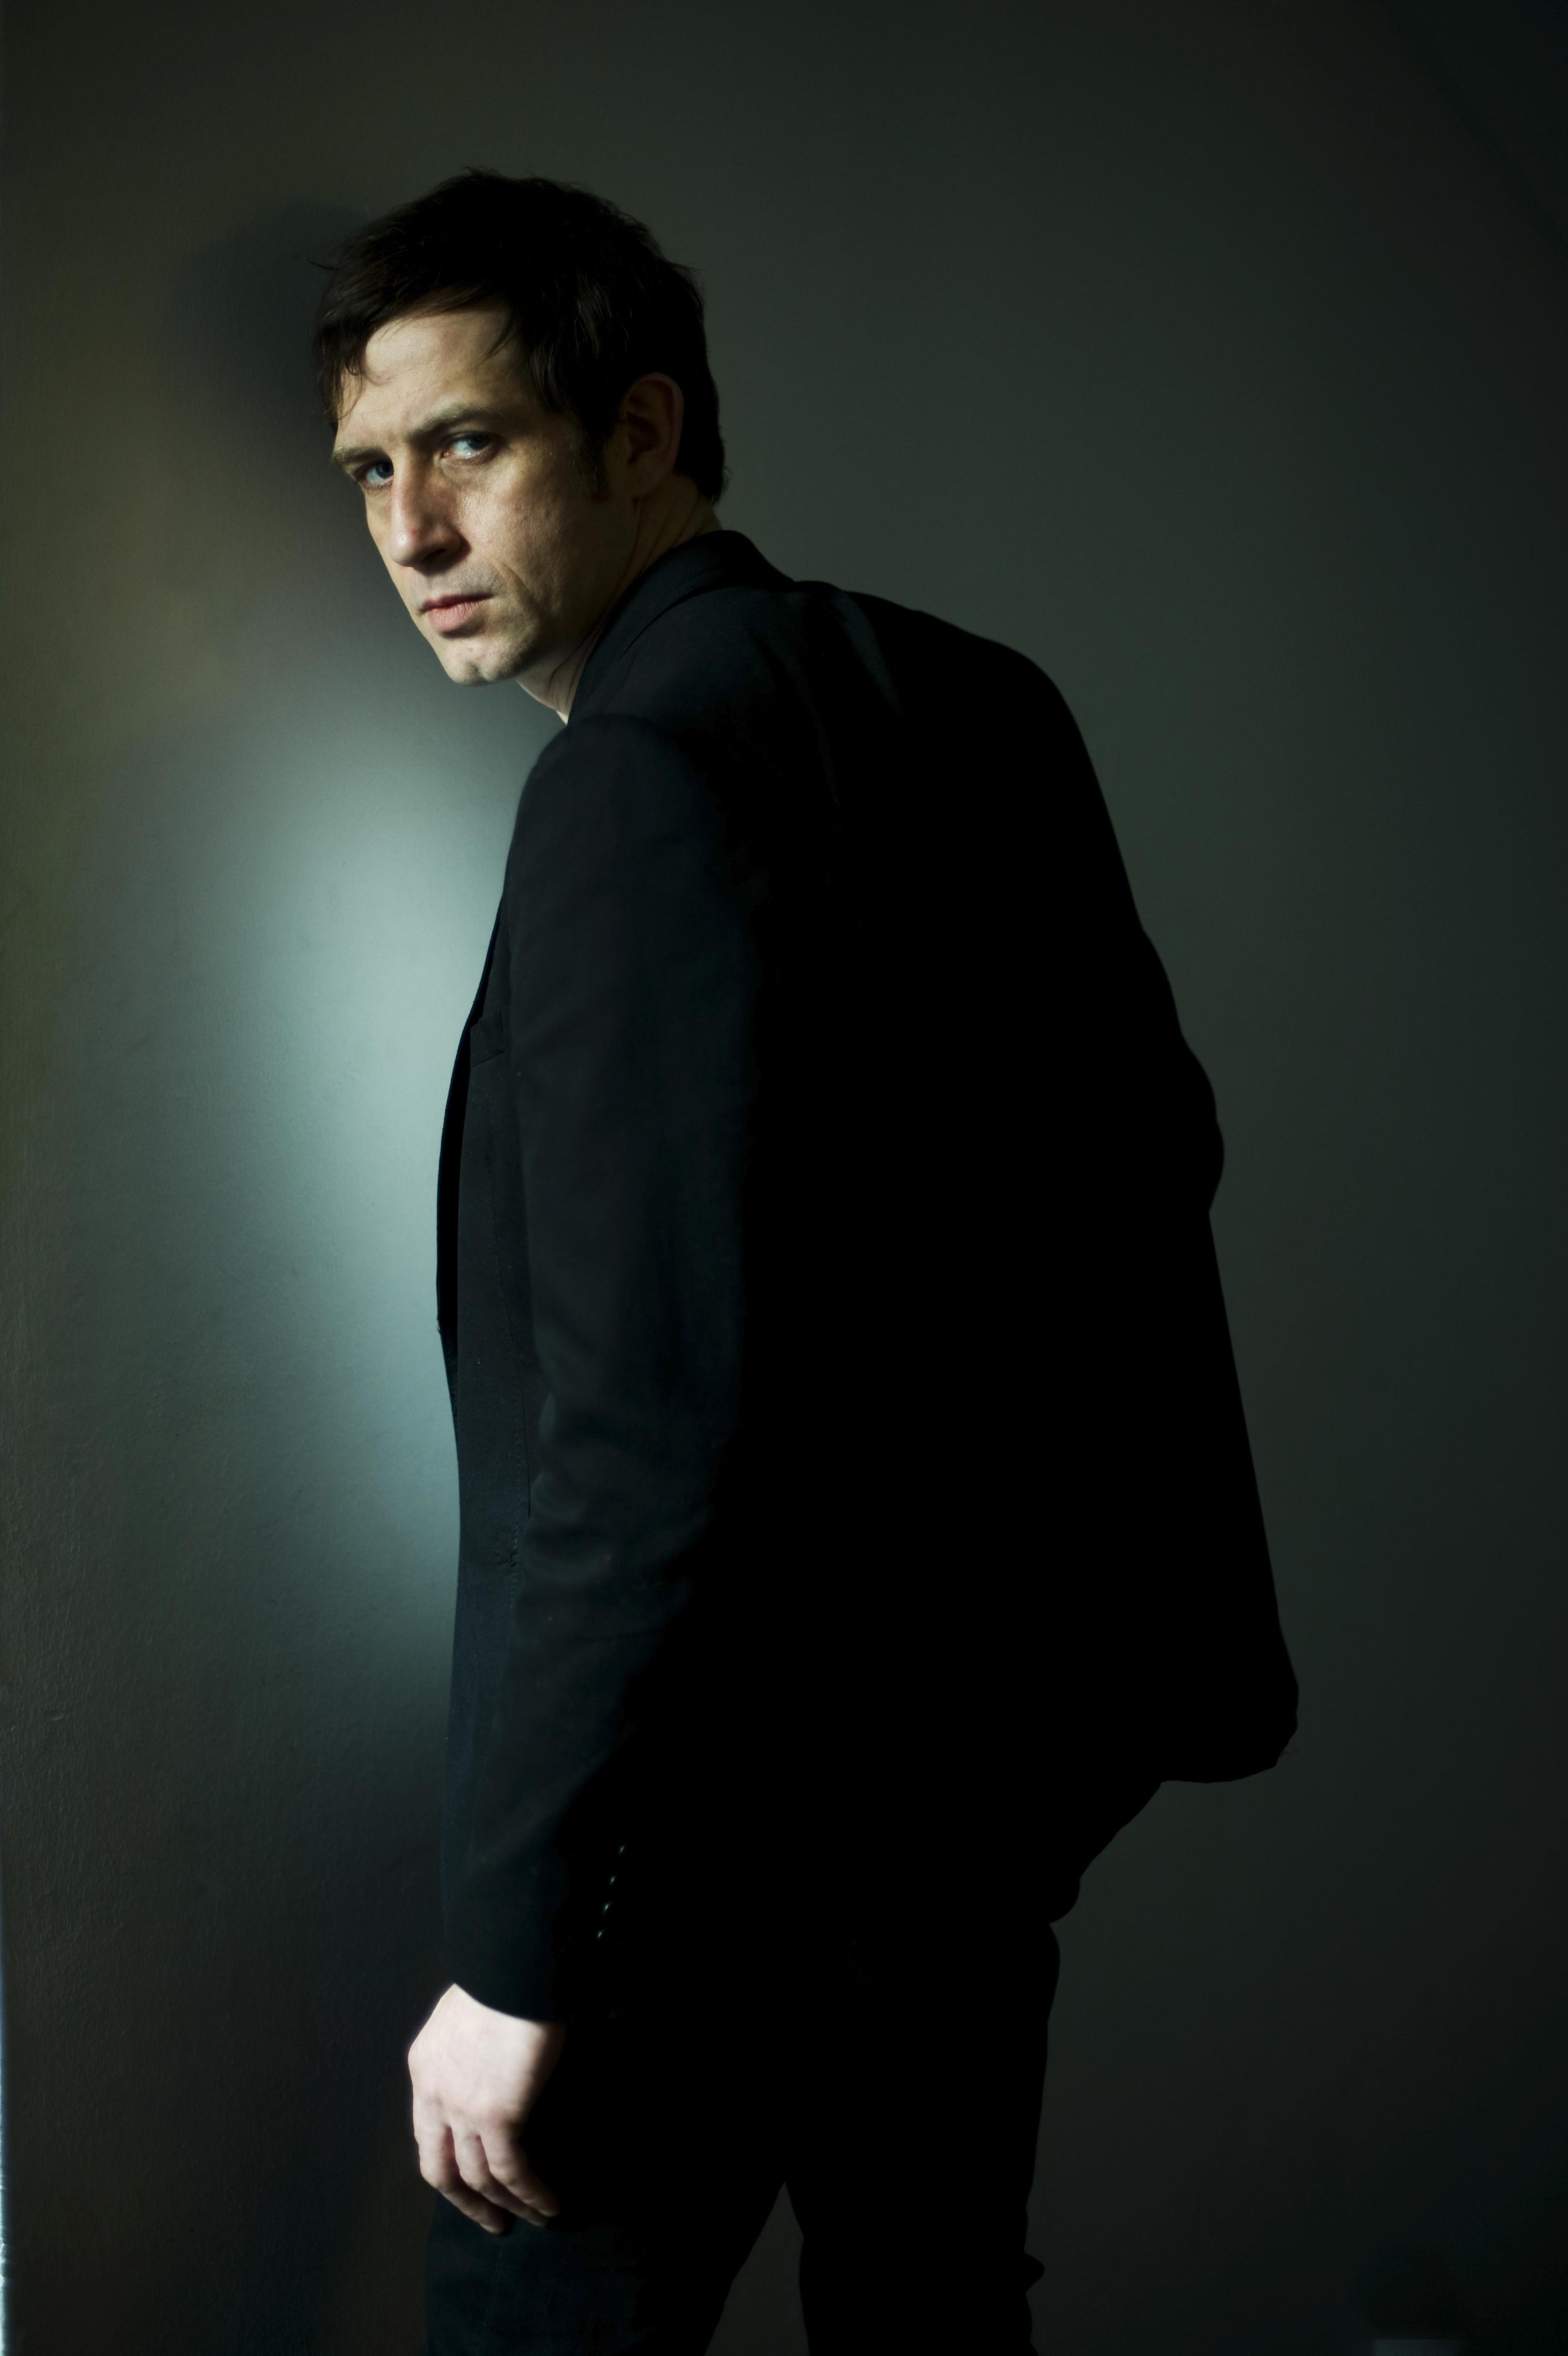 André Szymanski